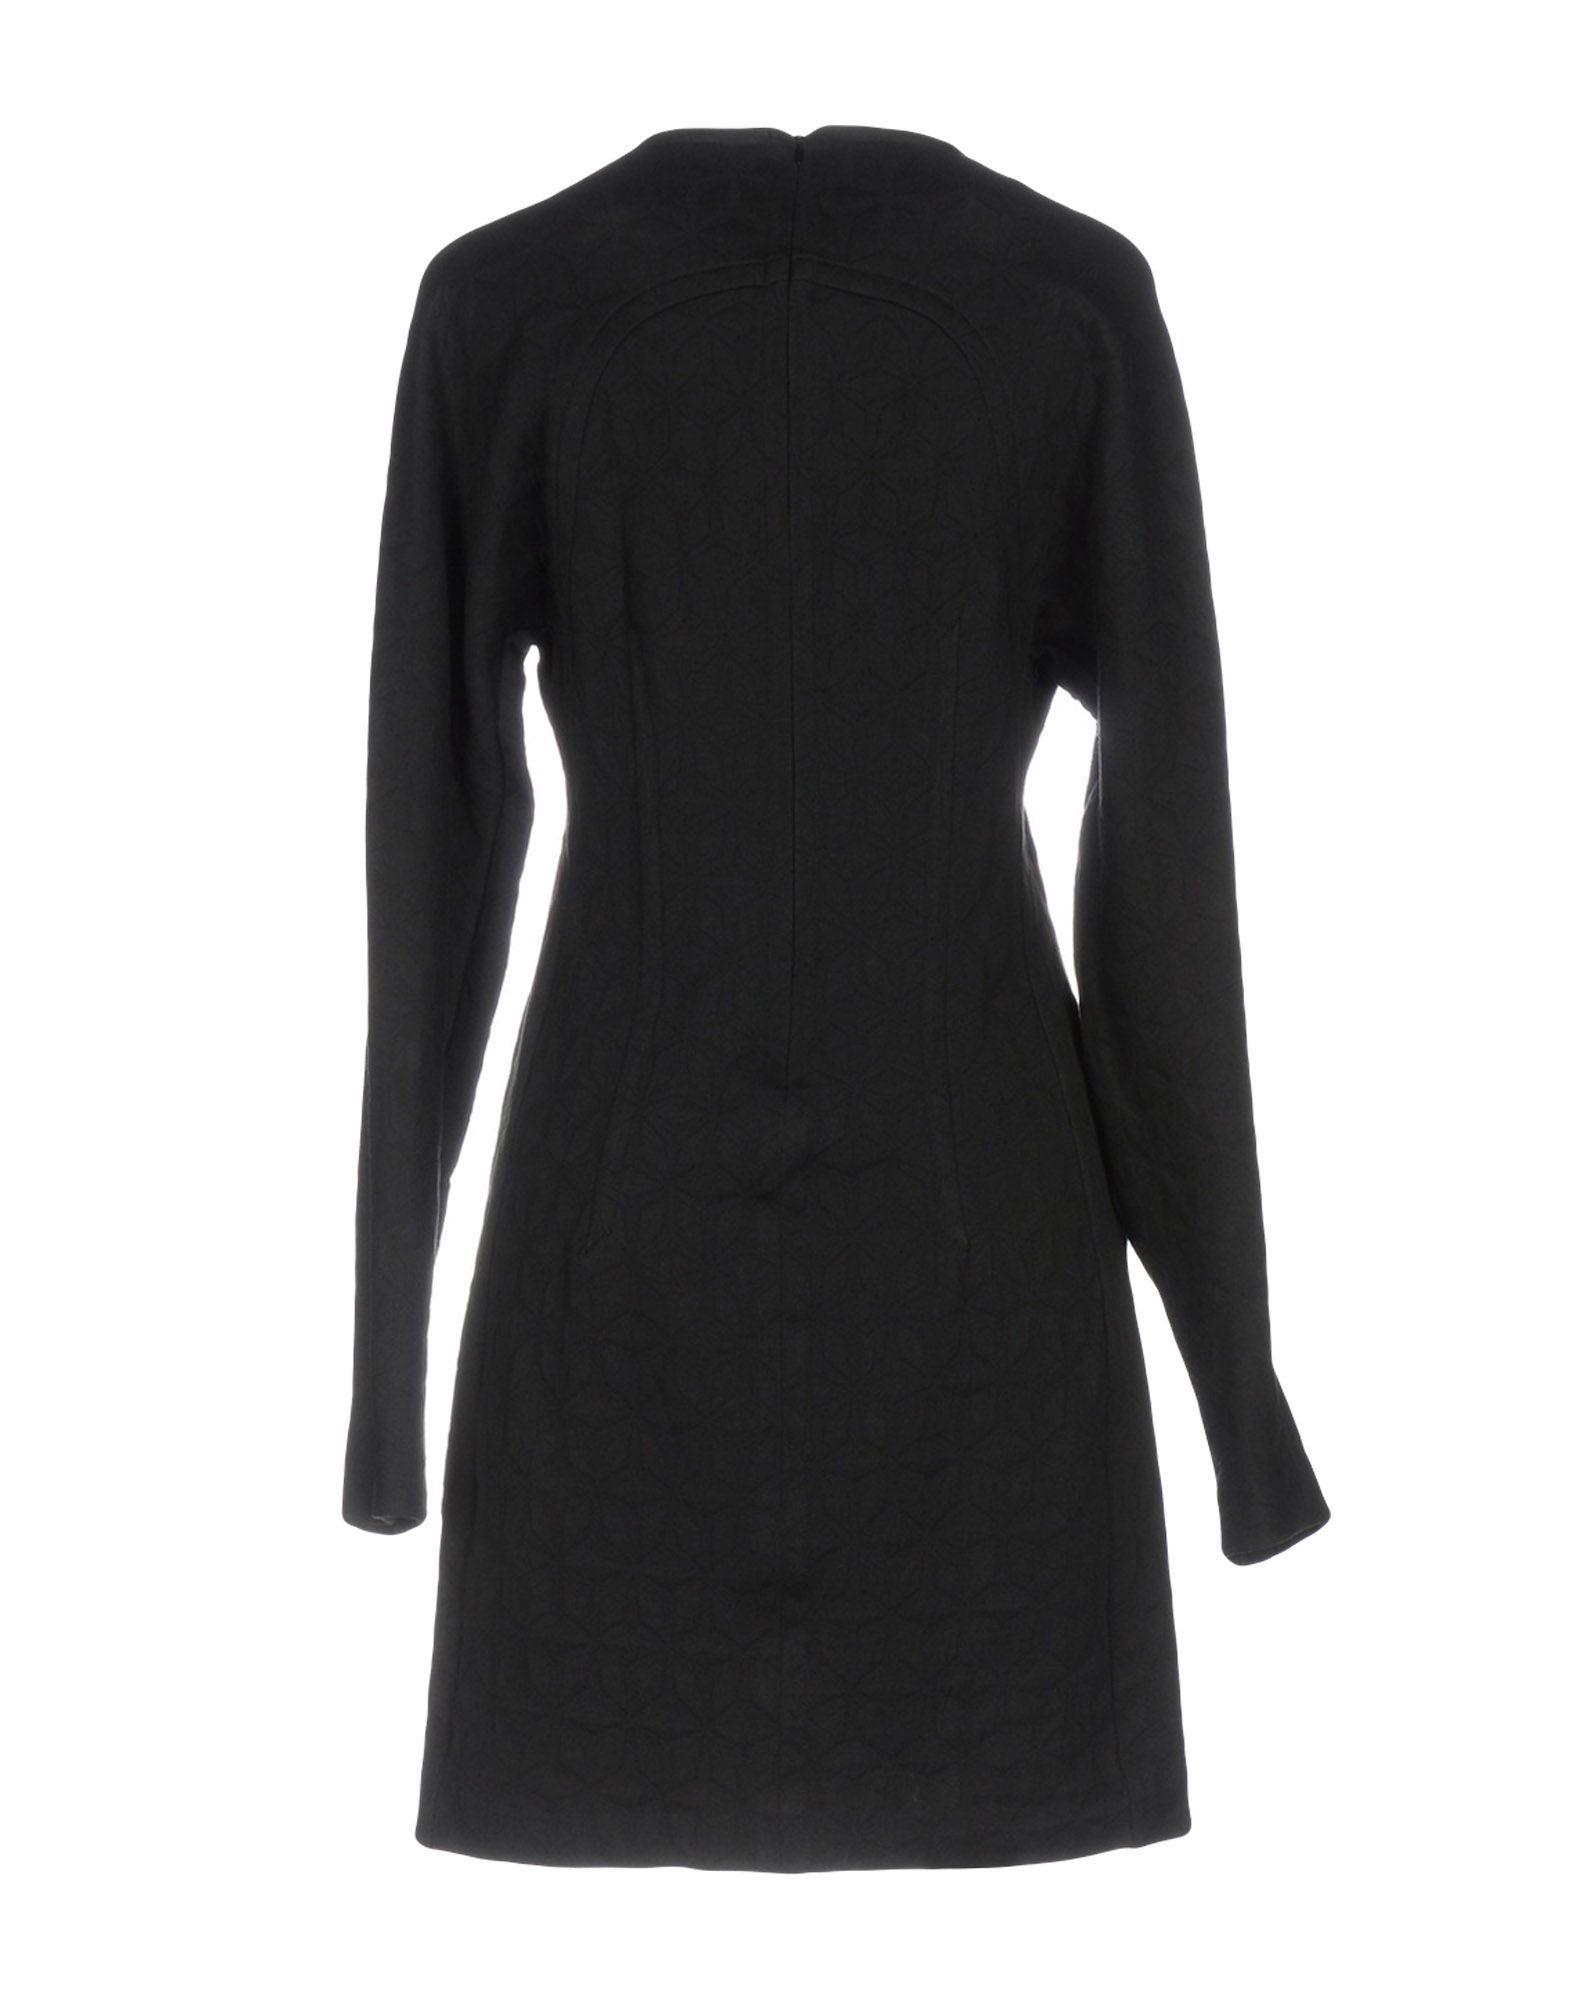 Mauro Grifoni Black Cotton Long Sleeve Dress